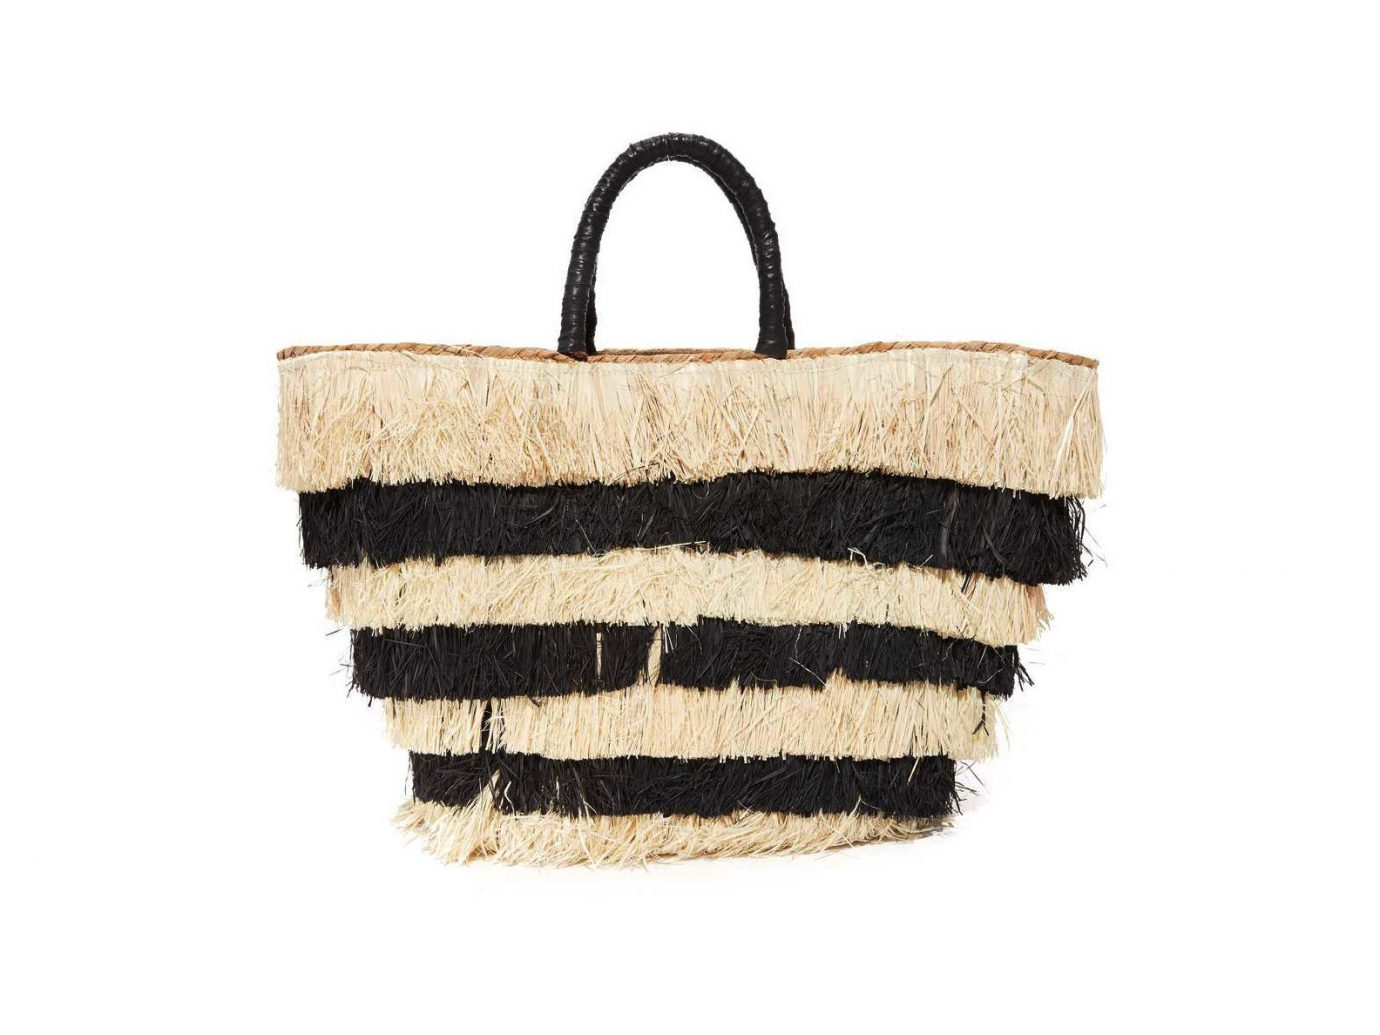 Style + Design handbag bag hairstyle fashion accessory lighting straw textile fur pattern moustache beige